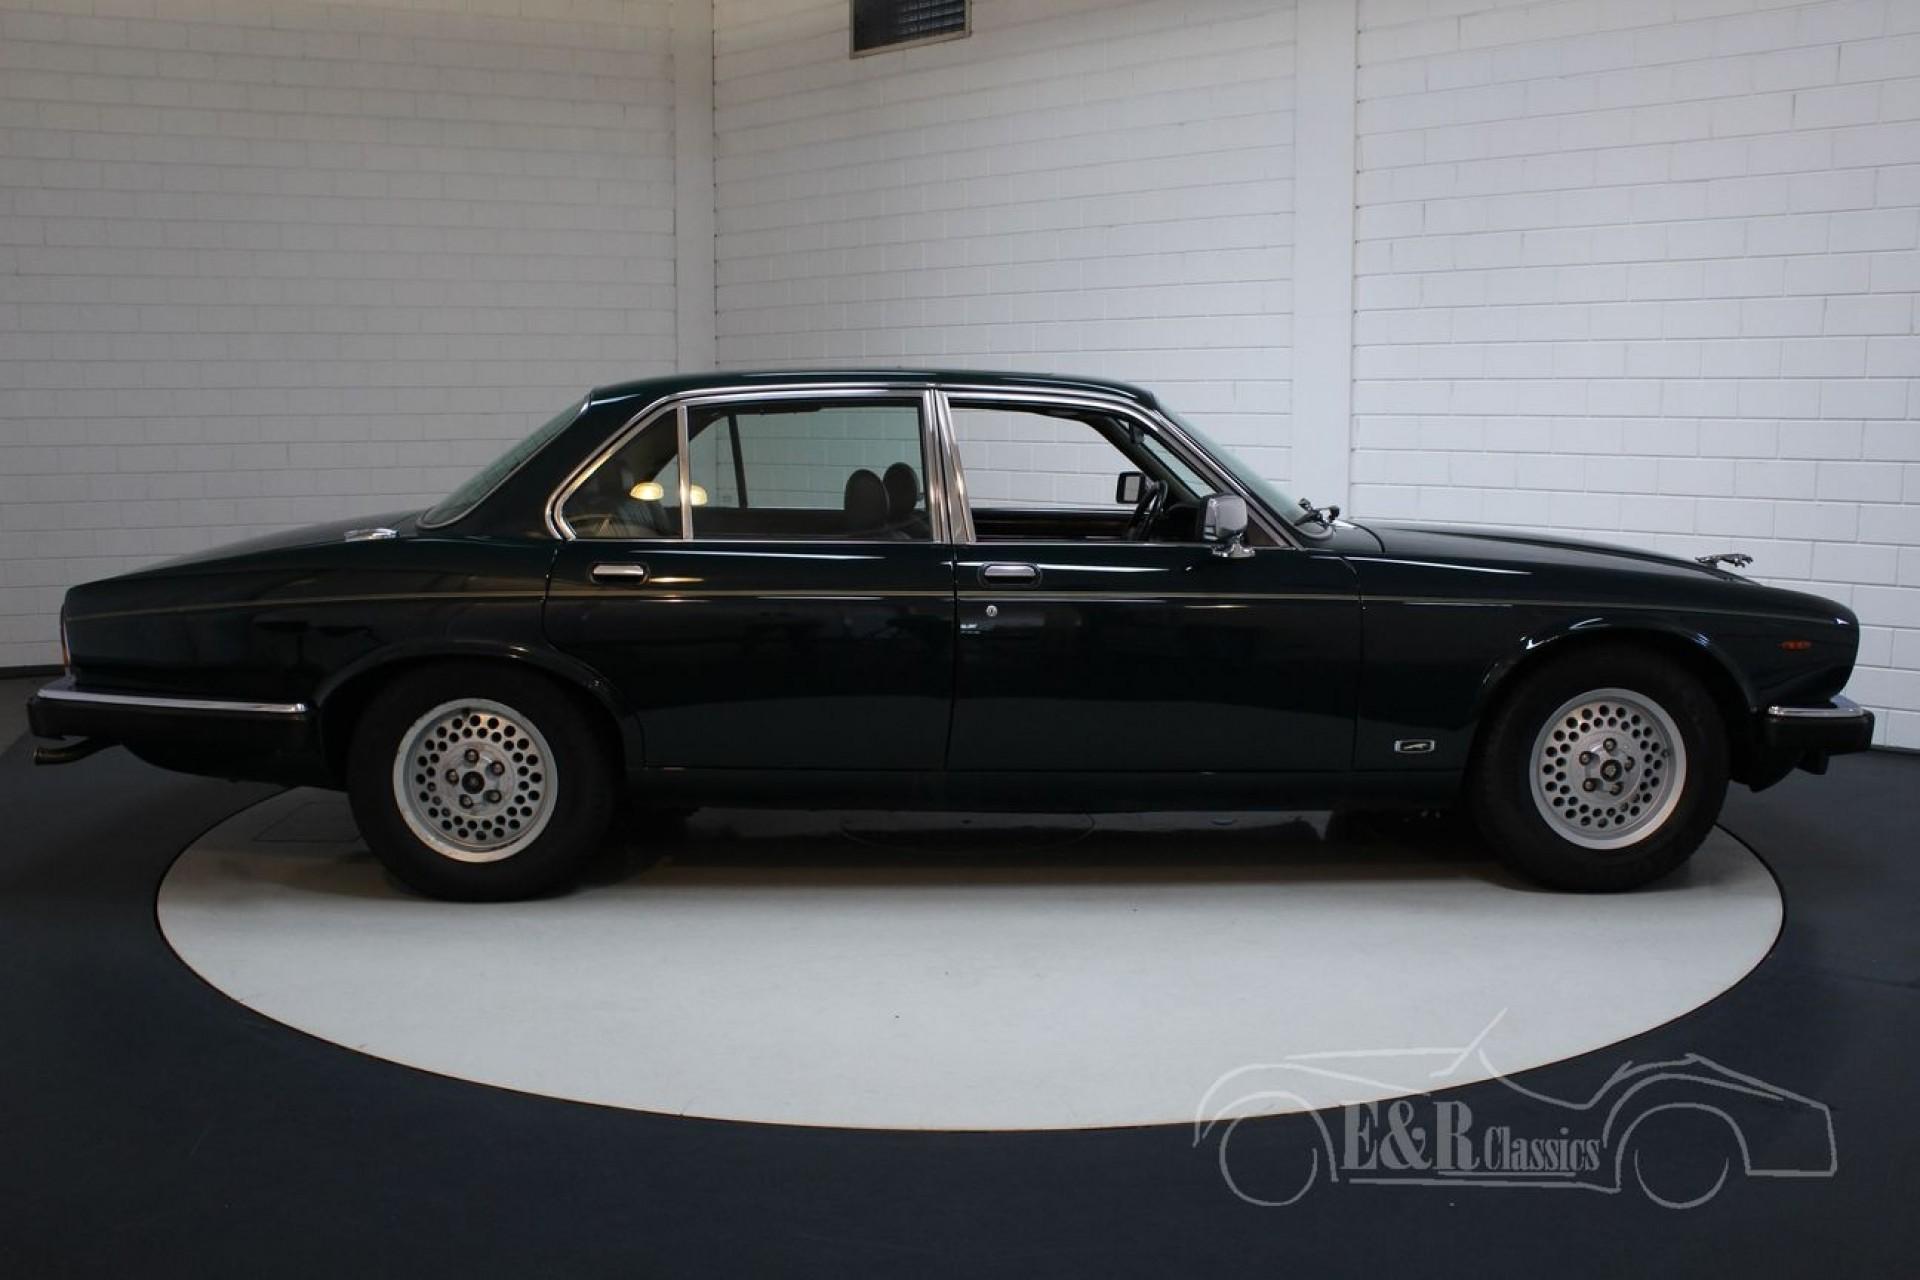 Jaguar XJ12 Series III 1991 British Racing Green for sale ...